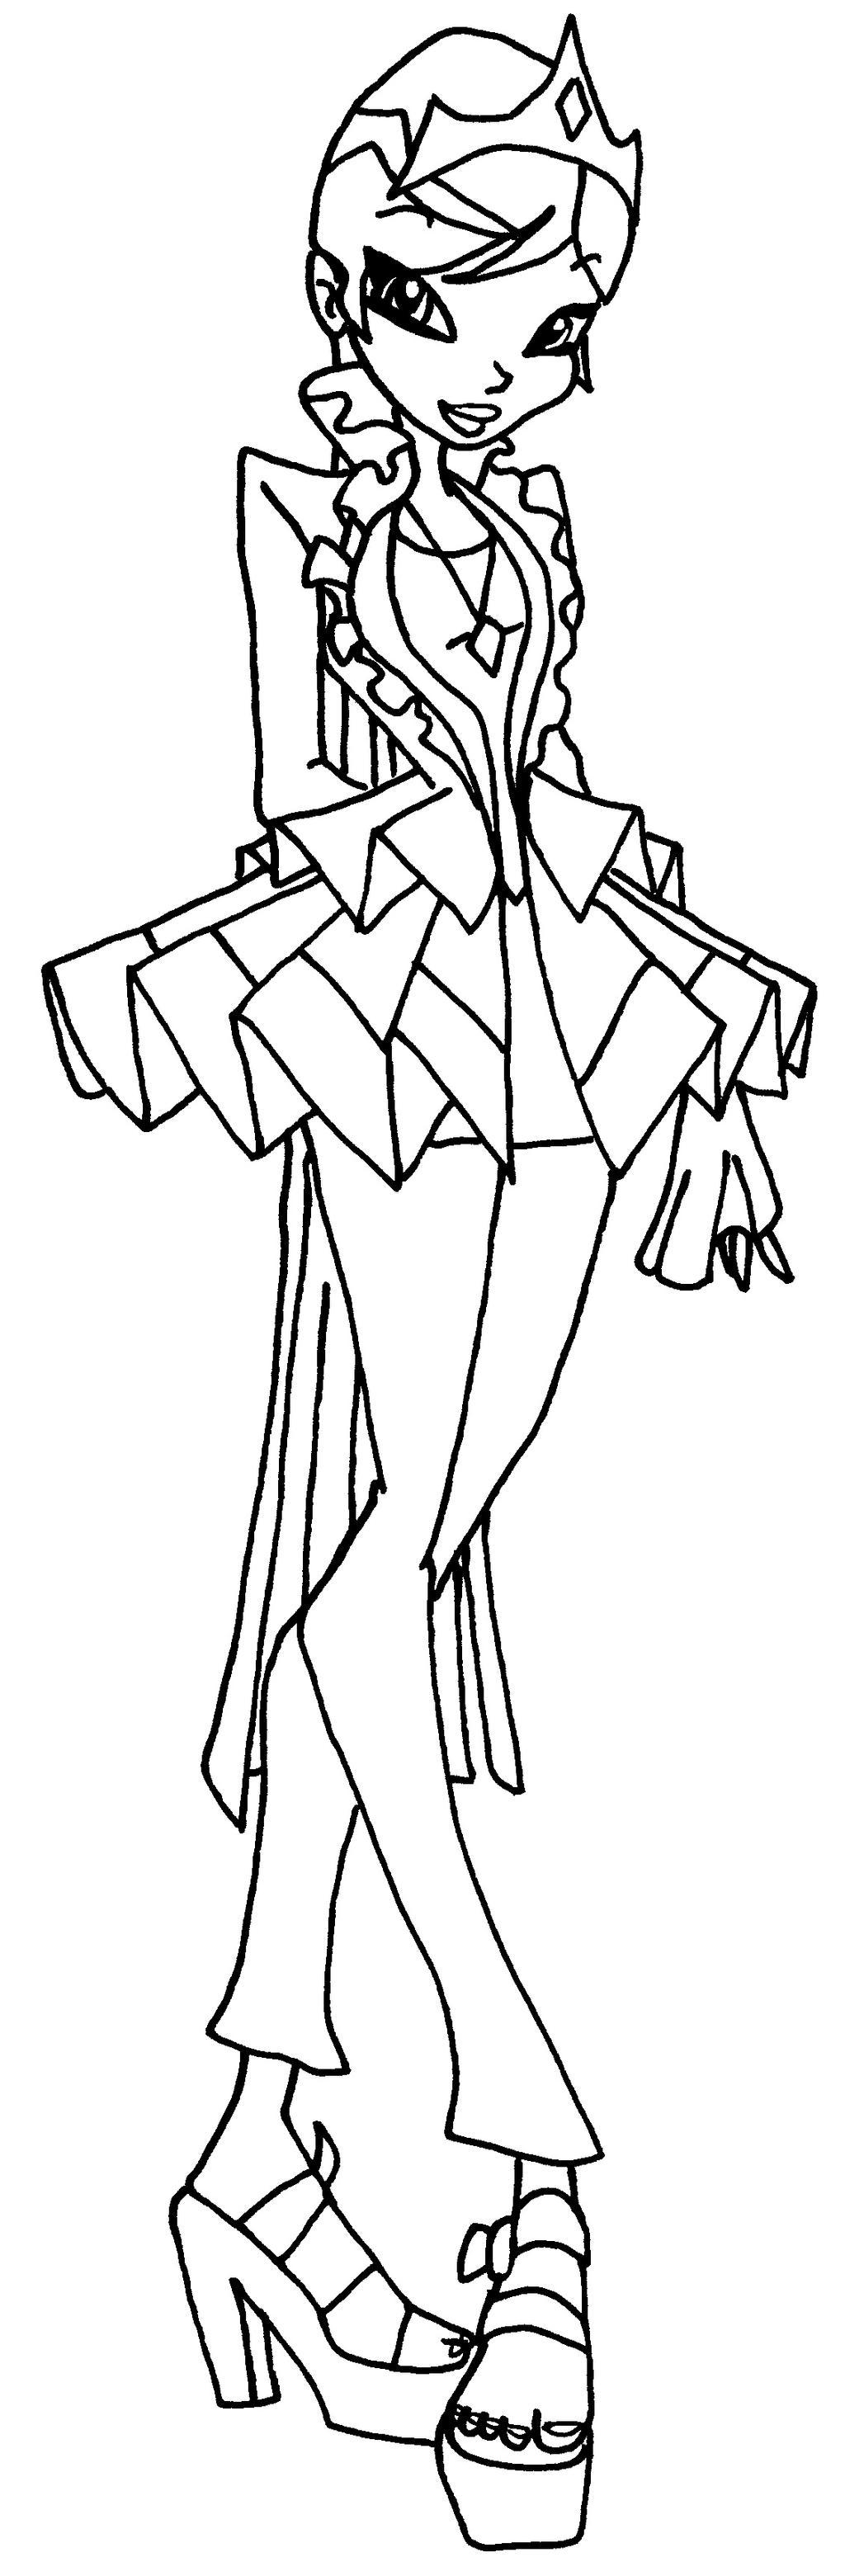 Winx princess coloring pages - Princess Galatea By Elfkena Princess Galatea By Elfkena